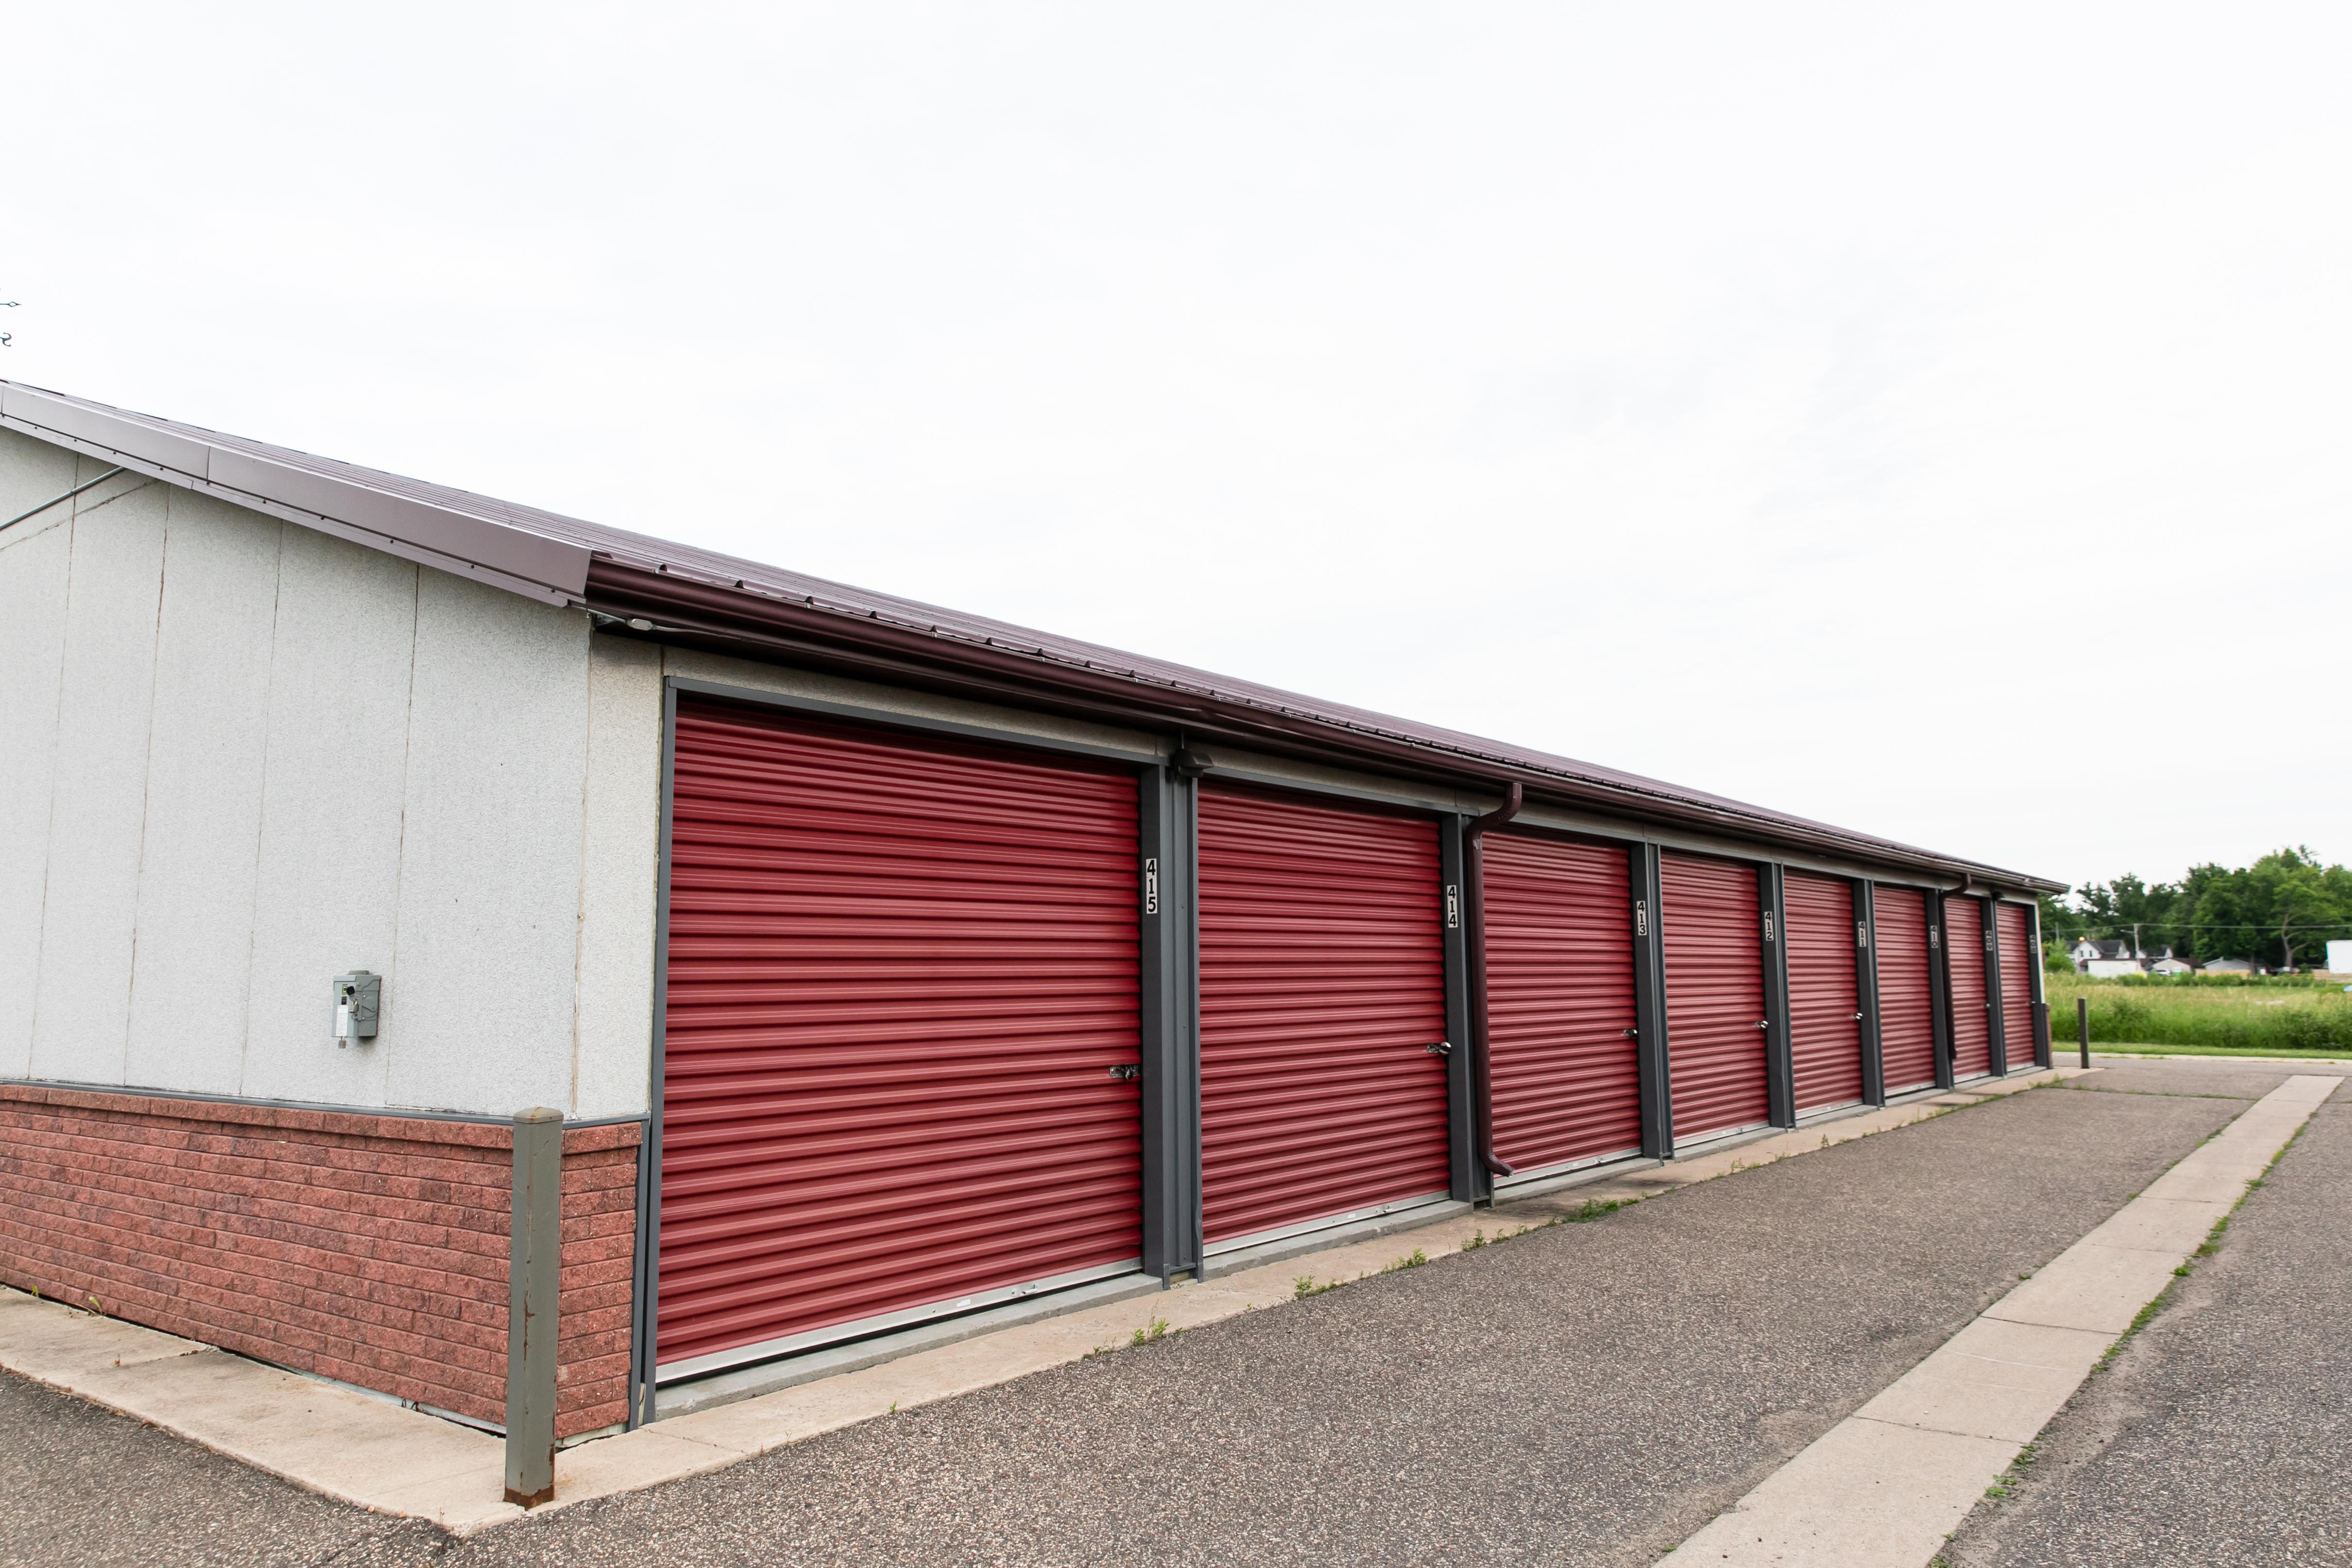 KO Storage of Maple Plain